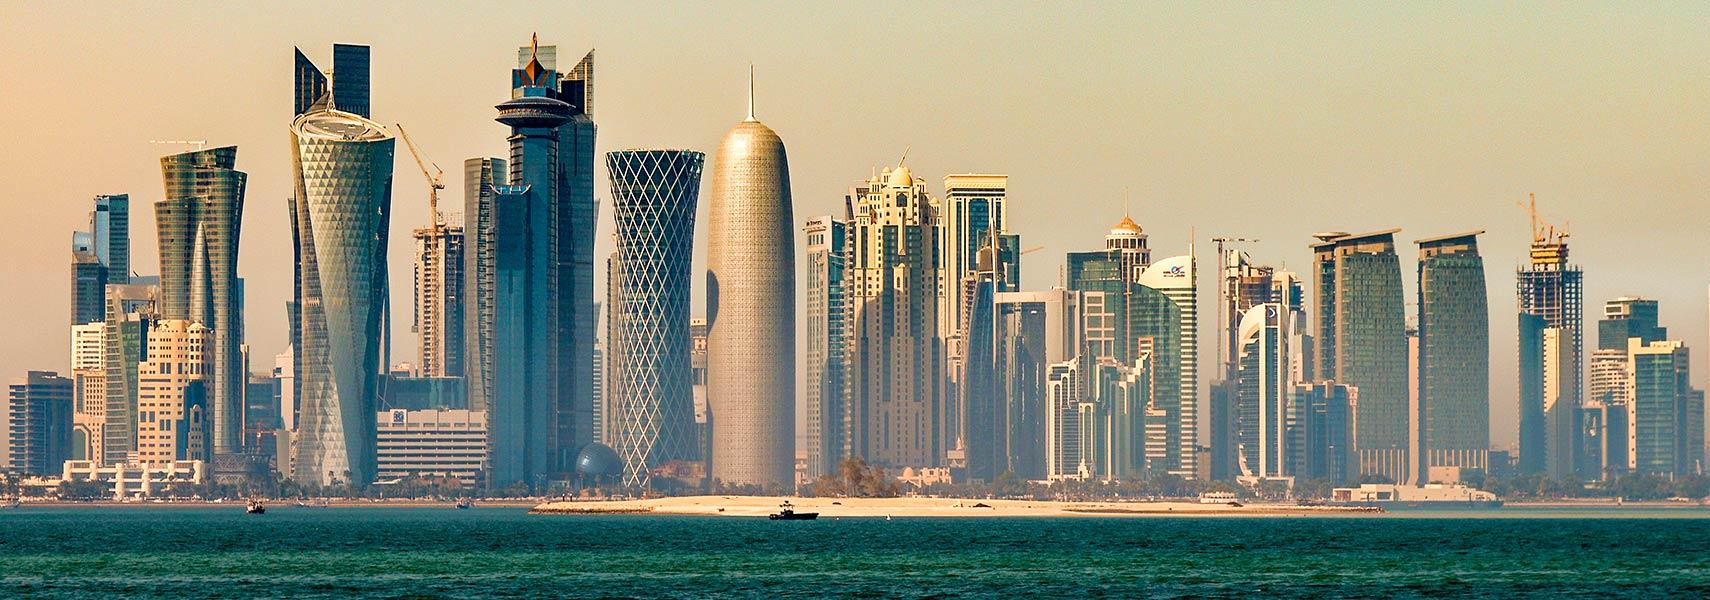 doha-skyline-in-the-morning.jpg